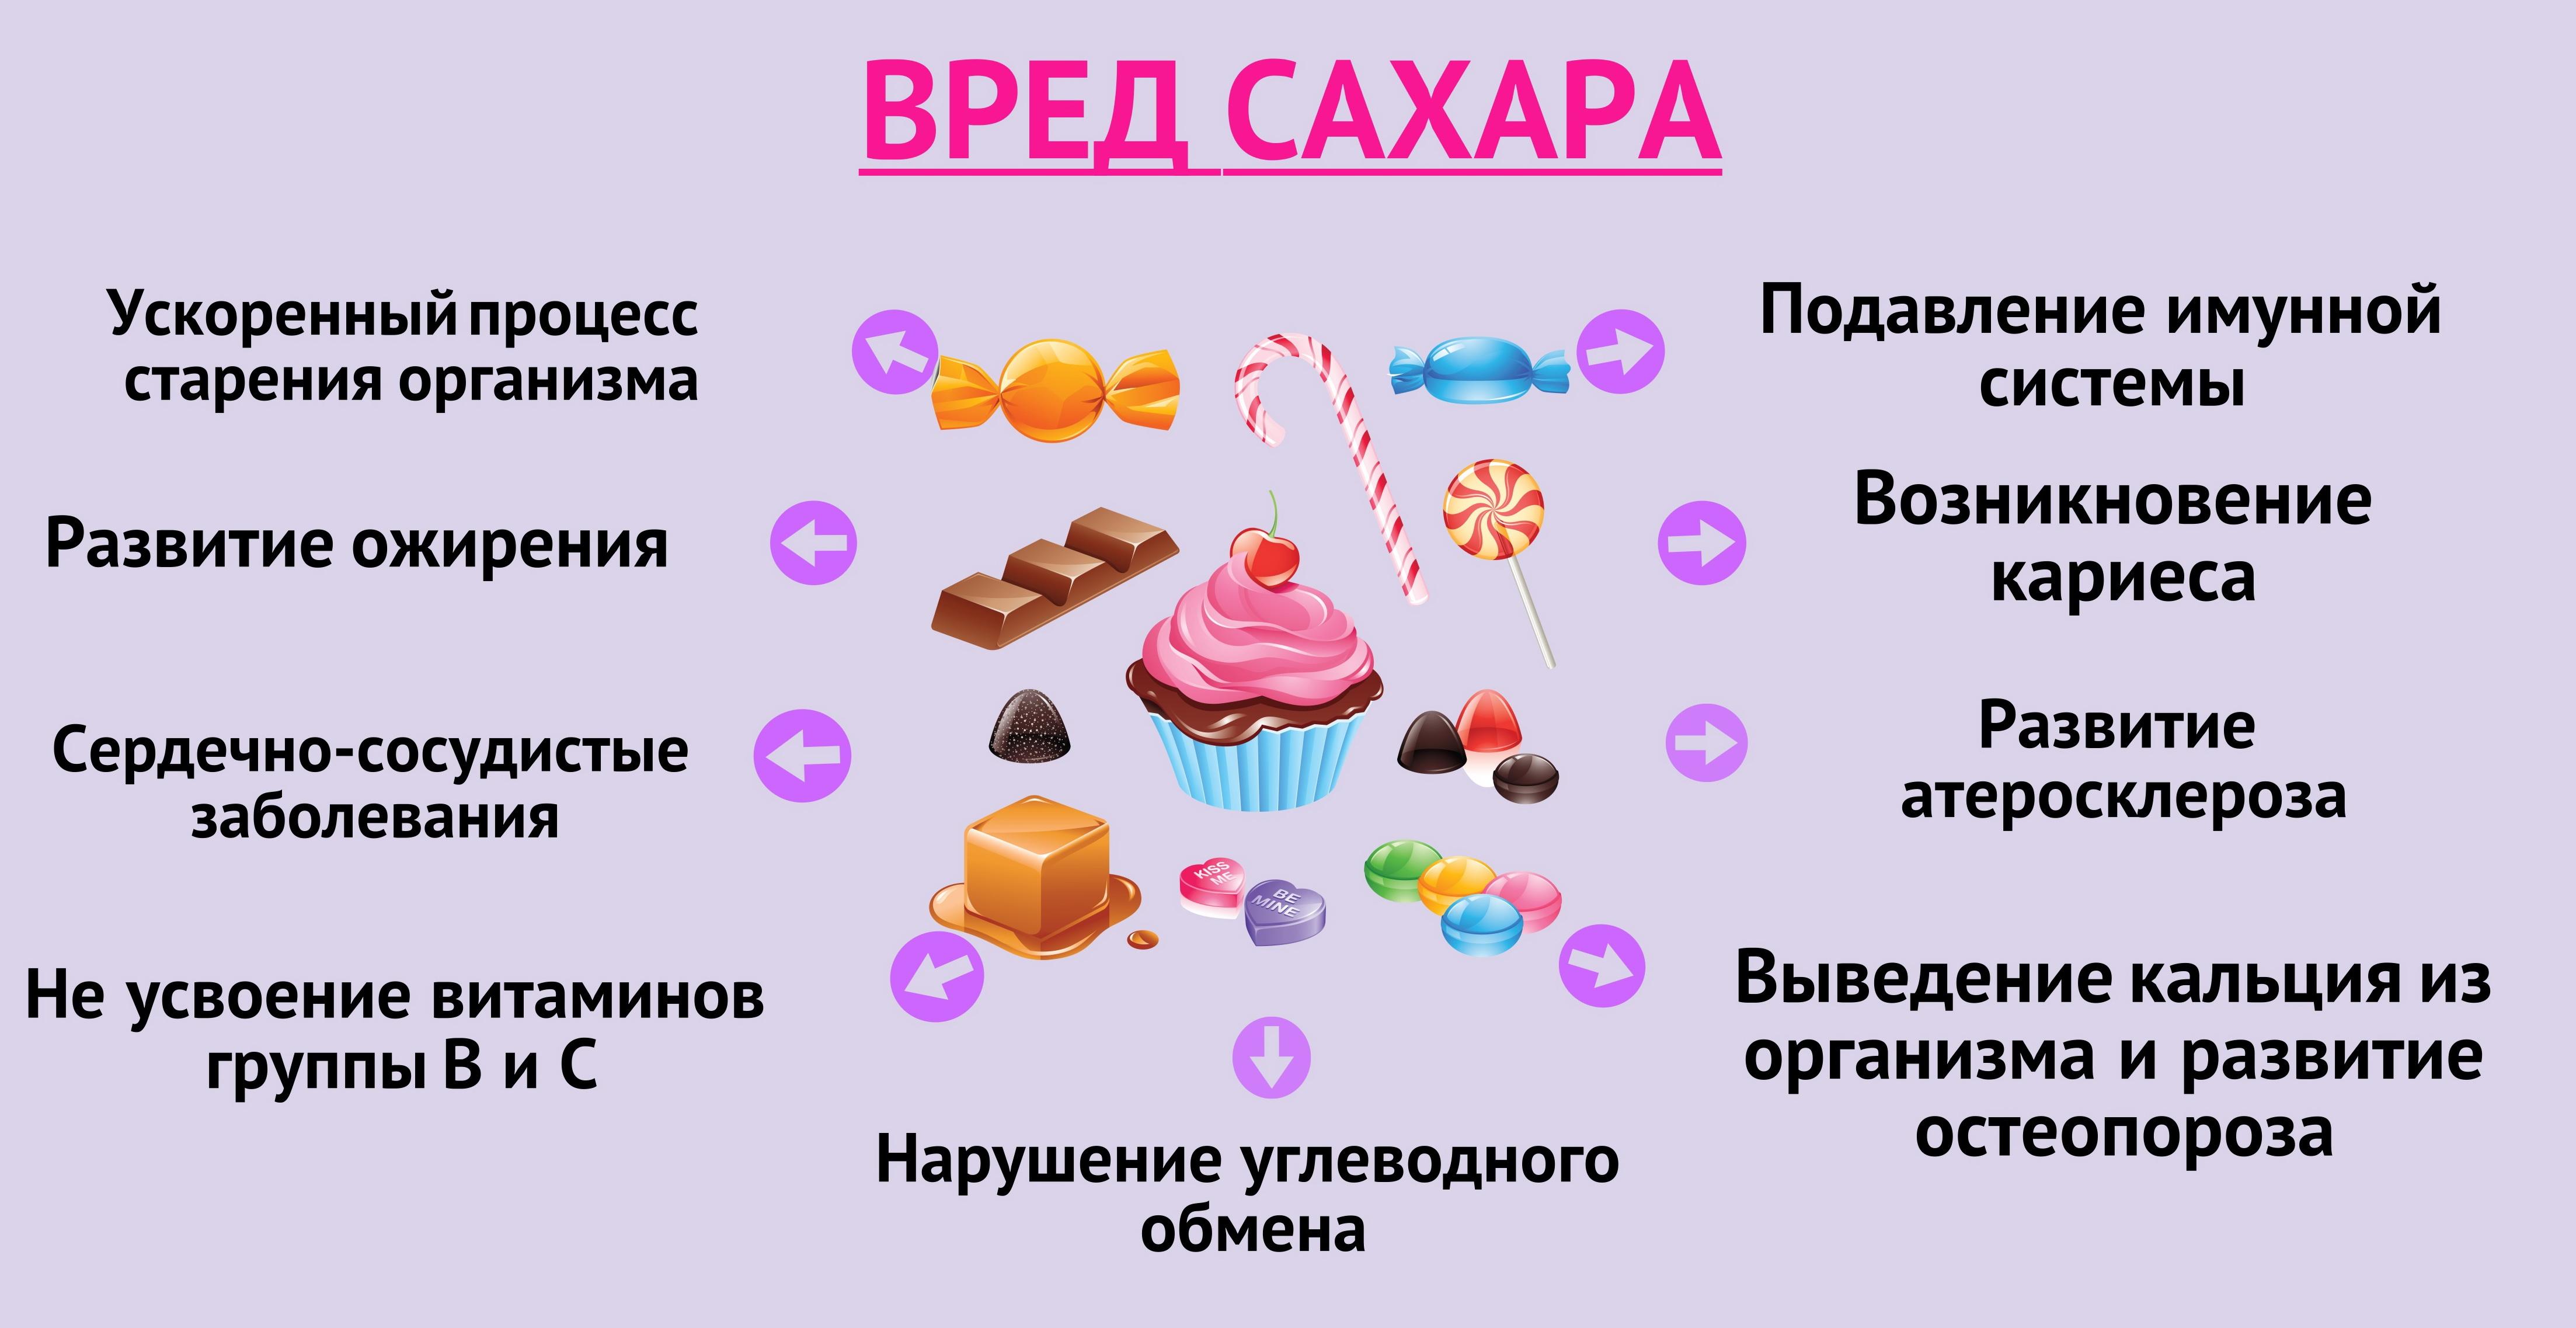 Сахар увеличивает риск заболевания